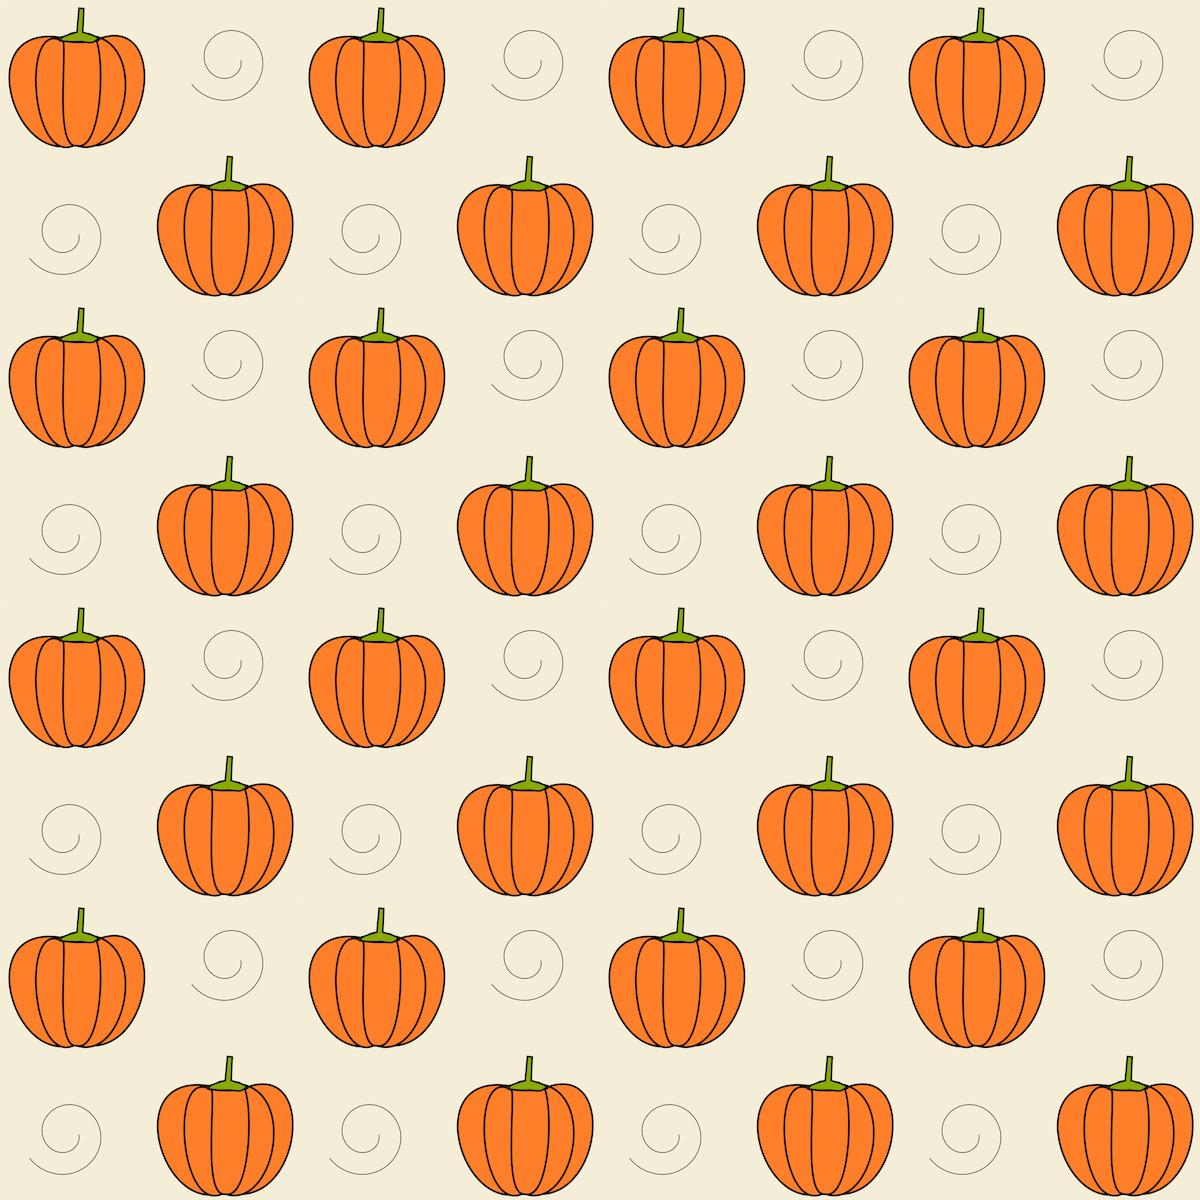 Free digital pumpkin scrapbooking paper ausdruckbares